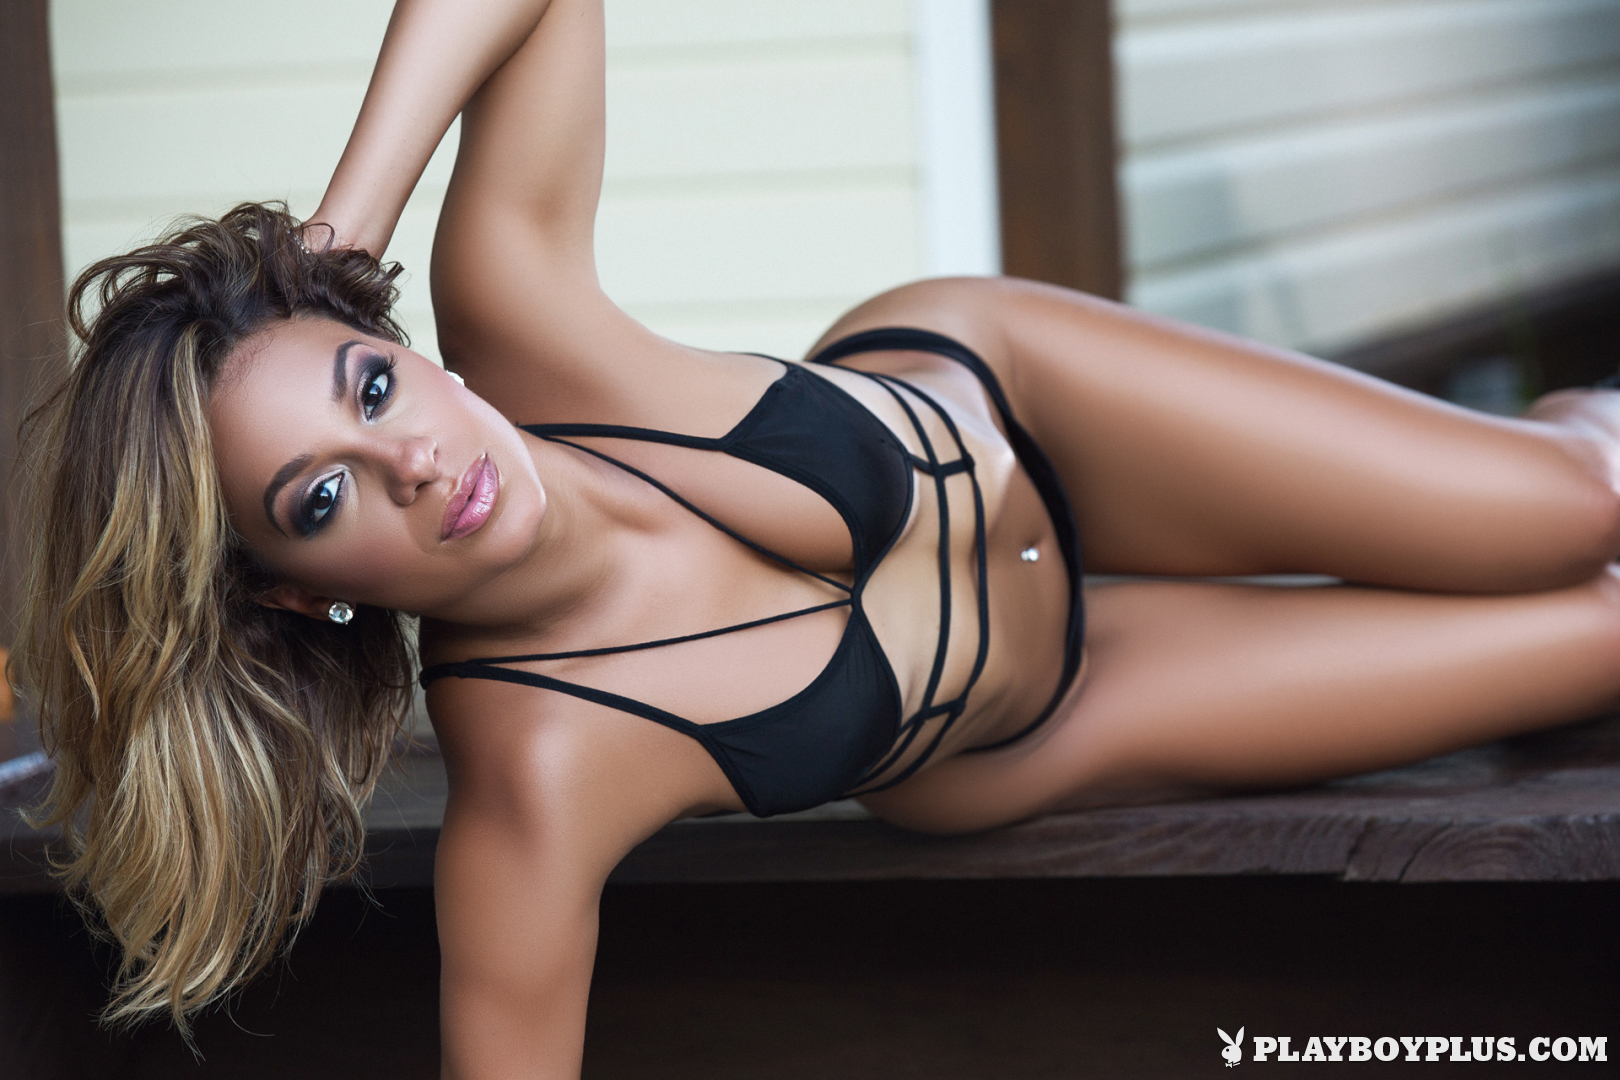 Playboy Cybergirl - Alisette Rodriguez Nude Photos & Videos at Playboy Plus! (in black bikini and high heels)